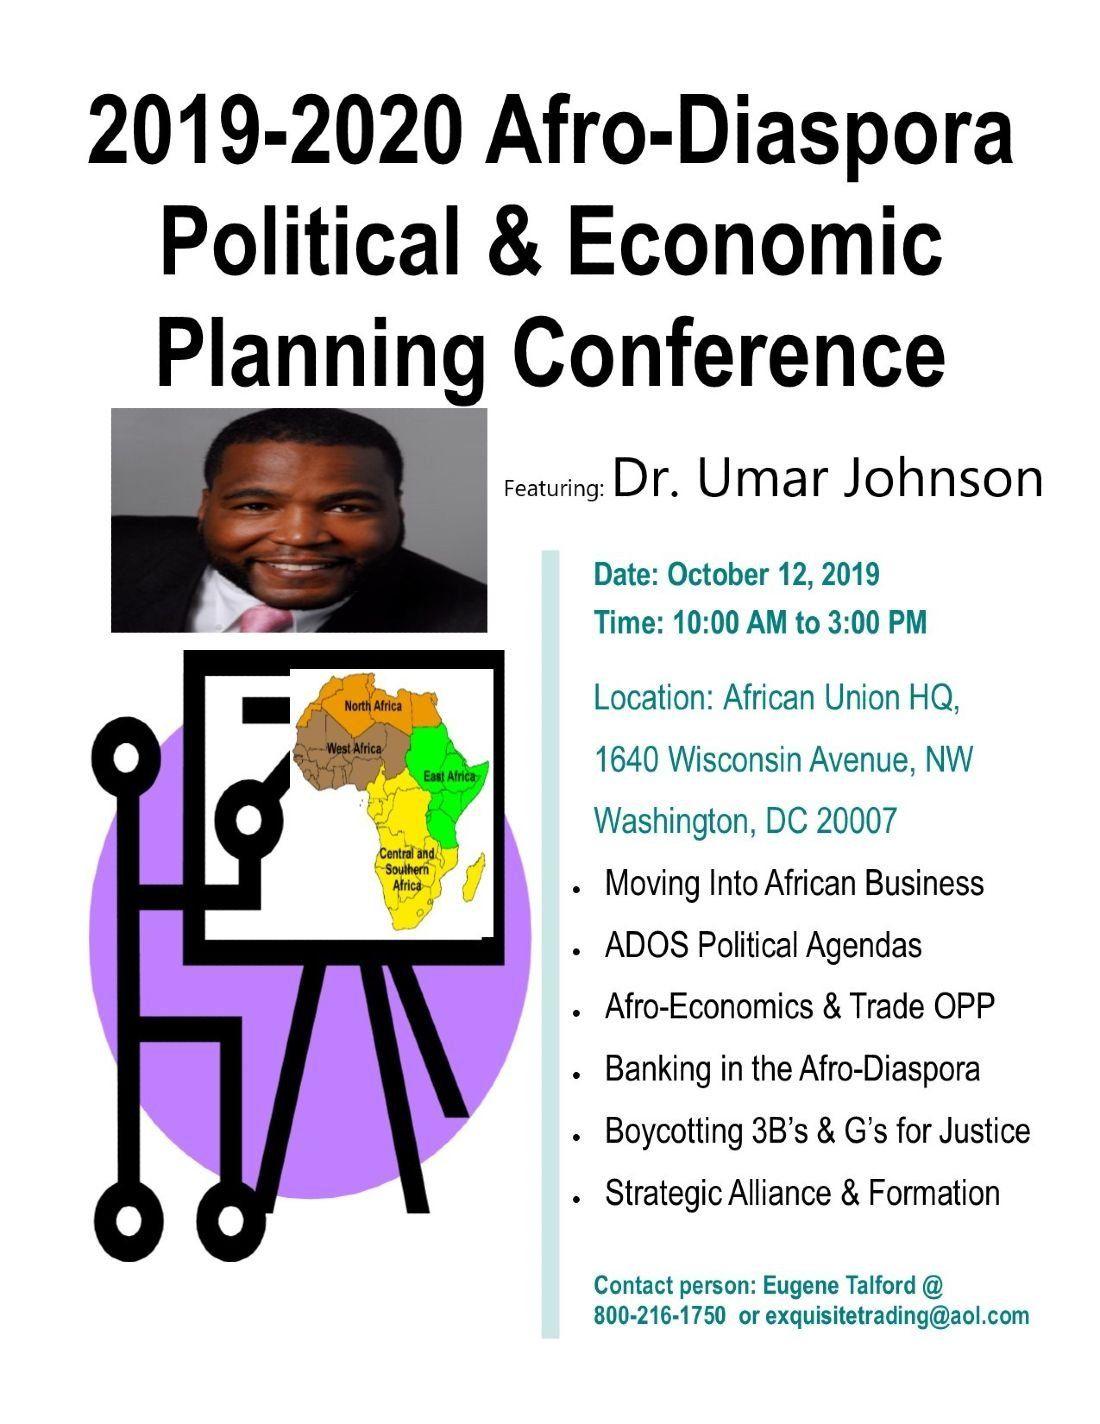 2019-2020 Afro-Diaspora Political & Economic Planning Conference